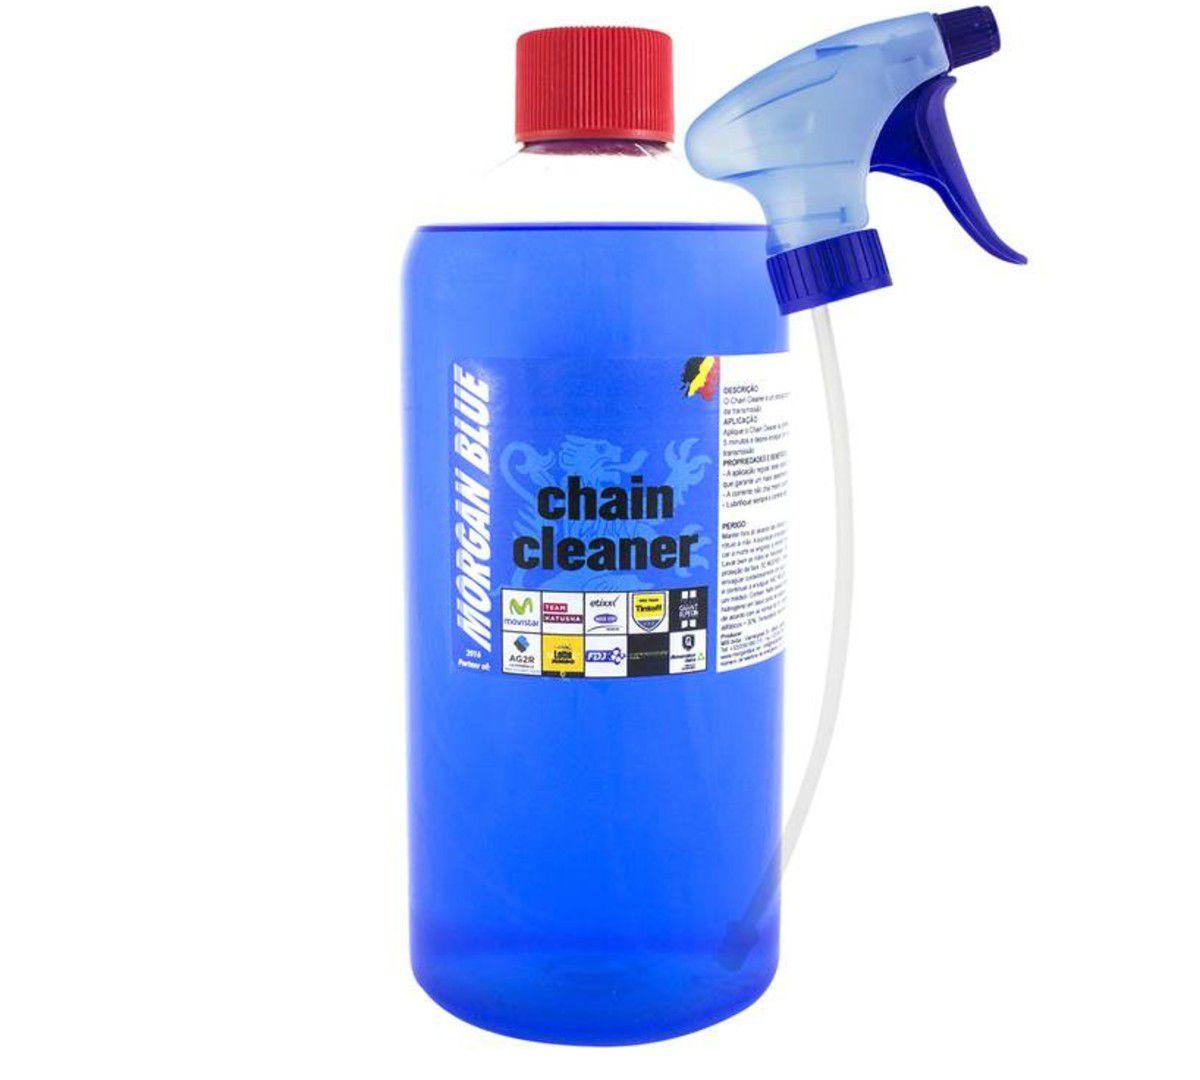 DESENGRAXANTE MORGAN BLUE CHAIN CLEANER 1L DETERGENTE COM BICO APLICADOR